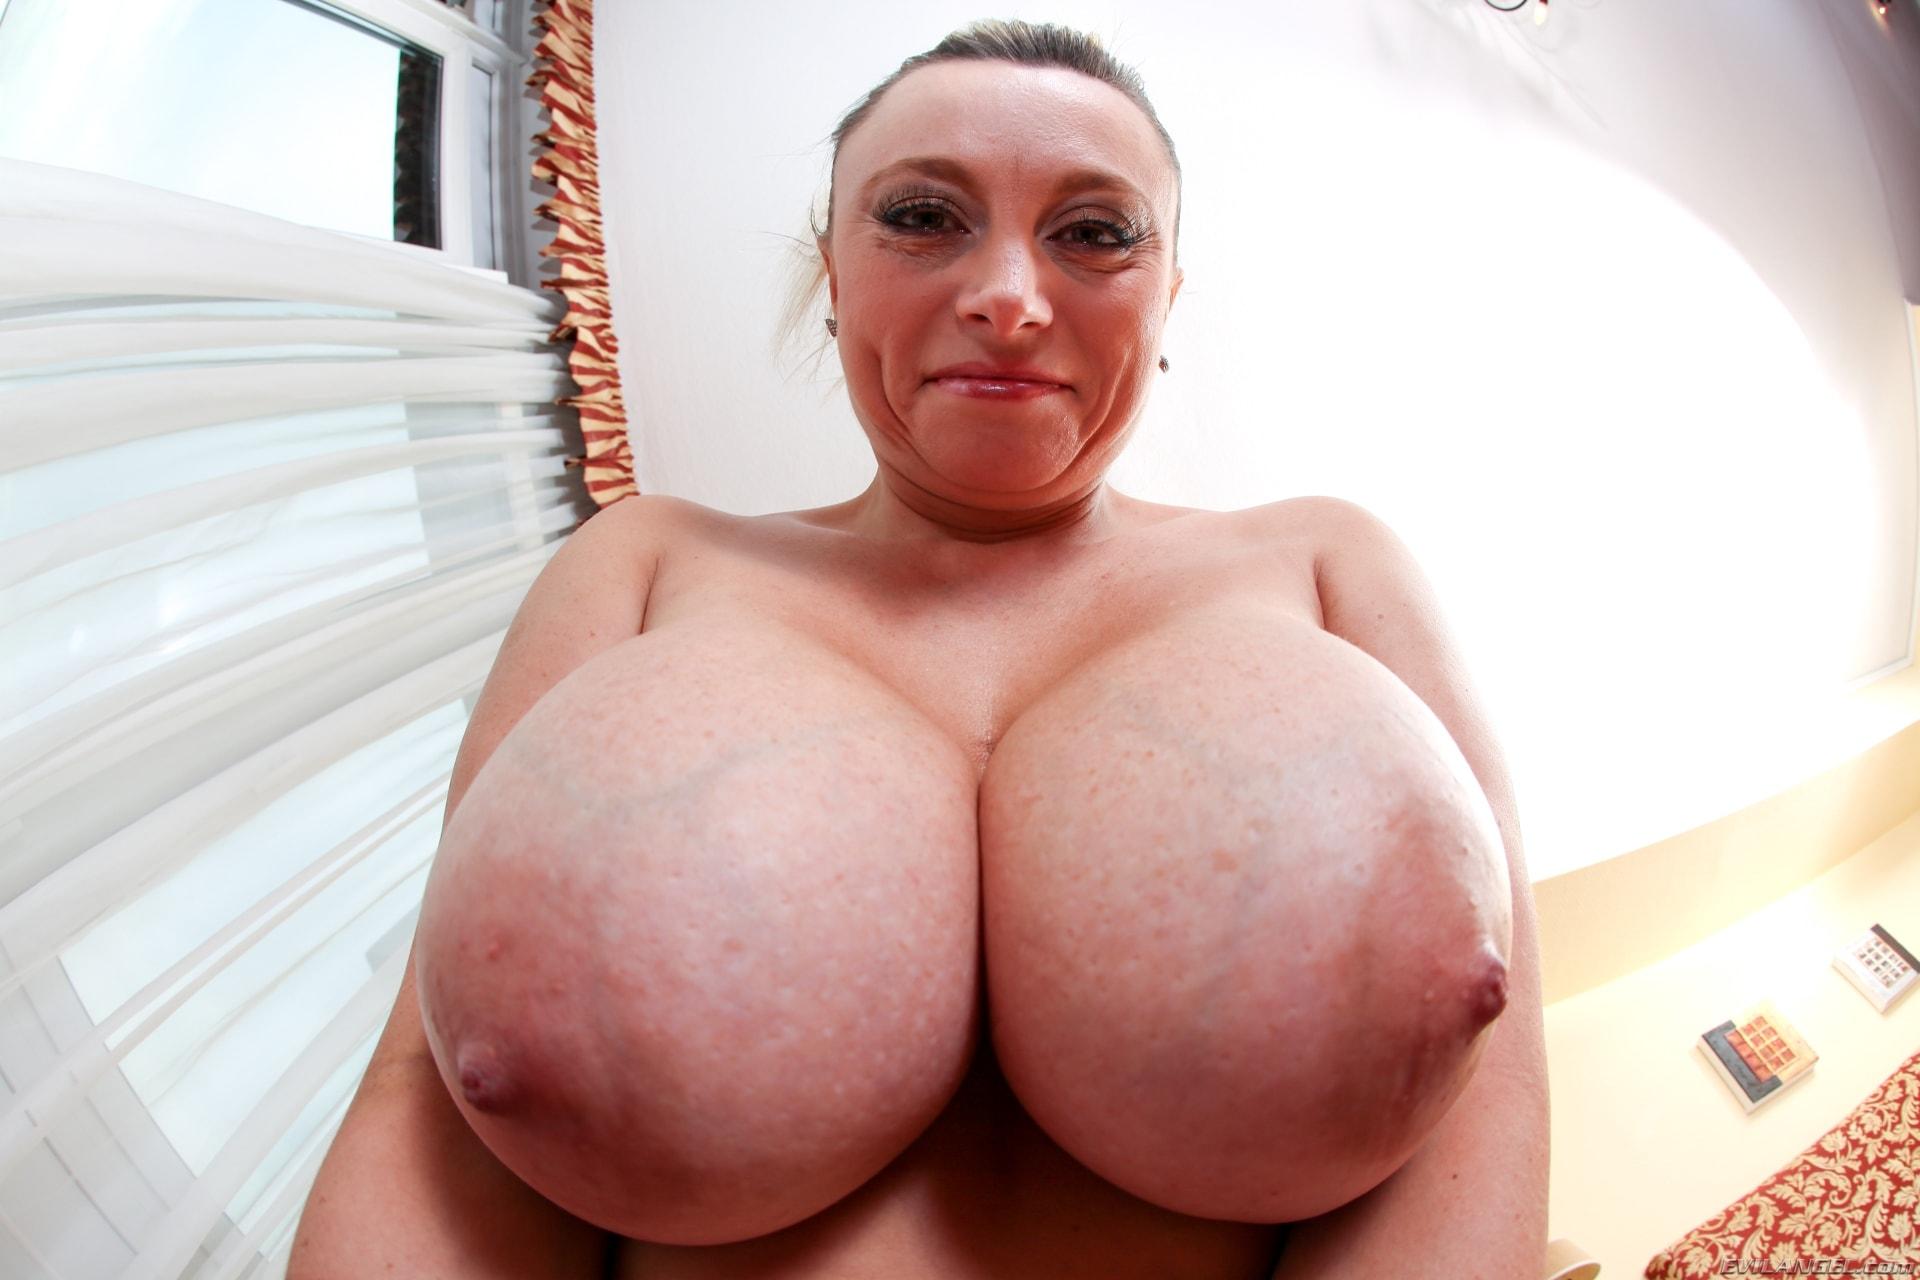 Bust wench sucks cock 4